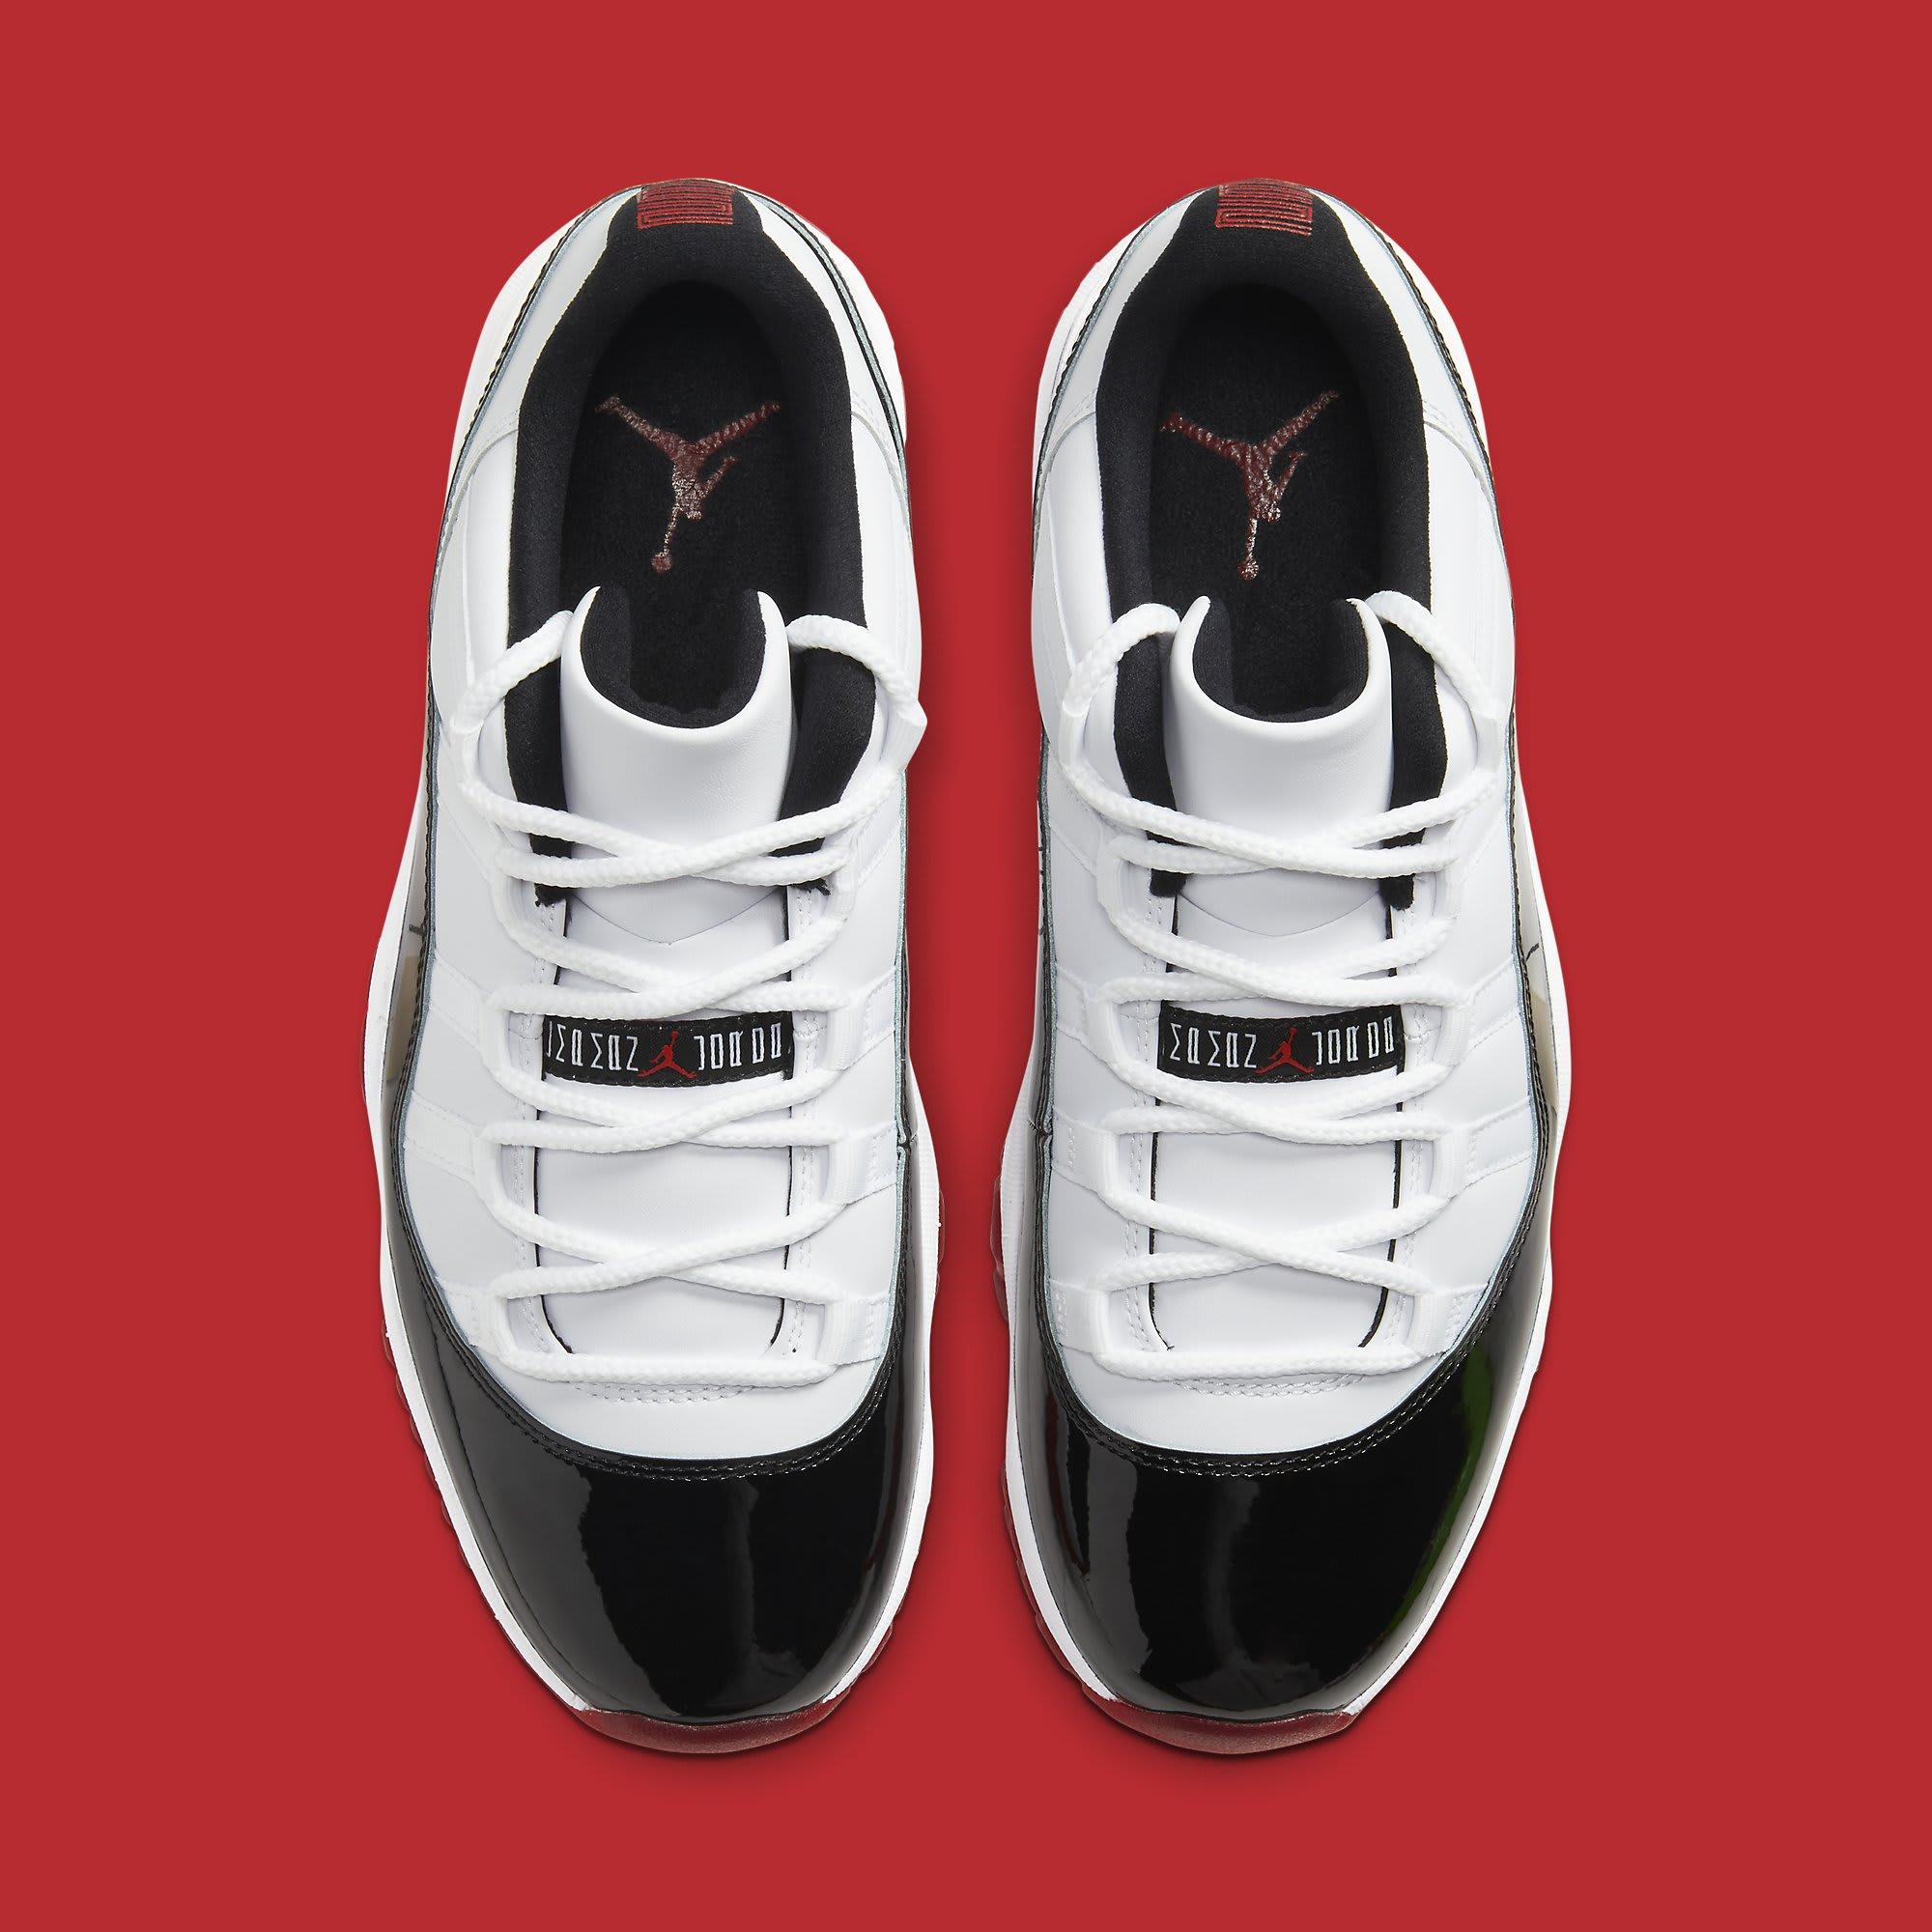 Air Jordan 11 Retro Low AV2187-160 Top